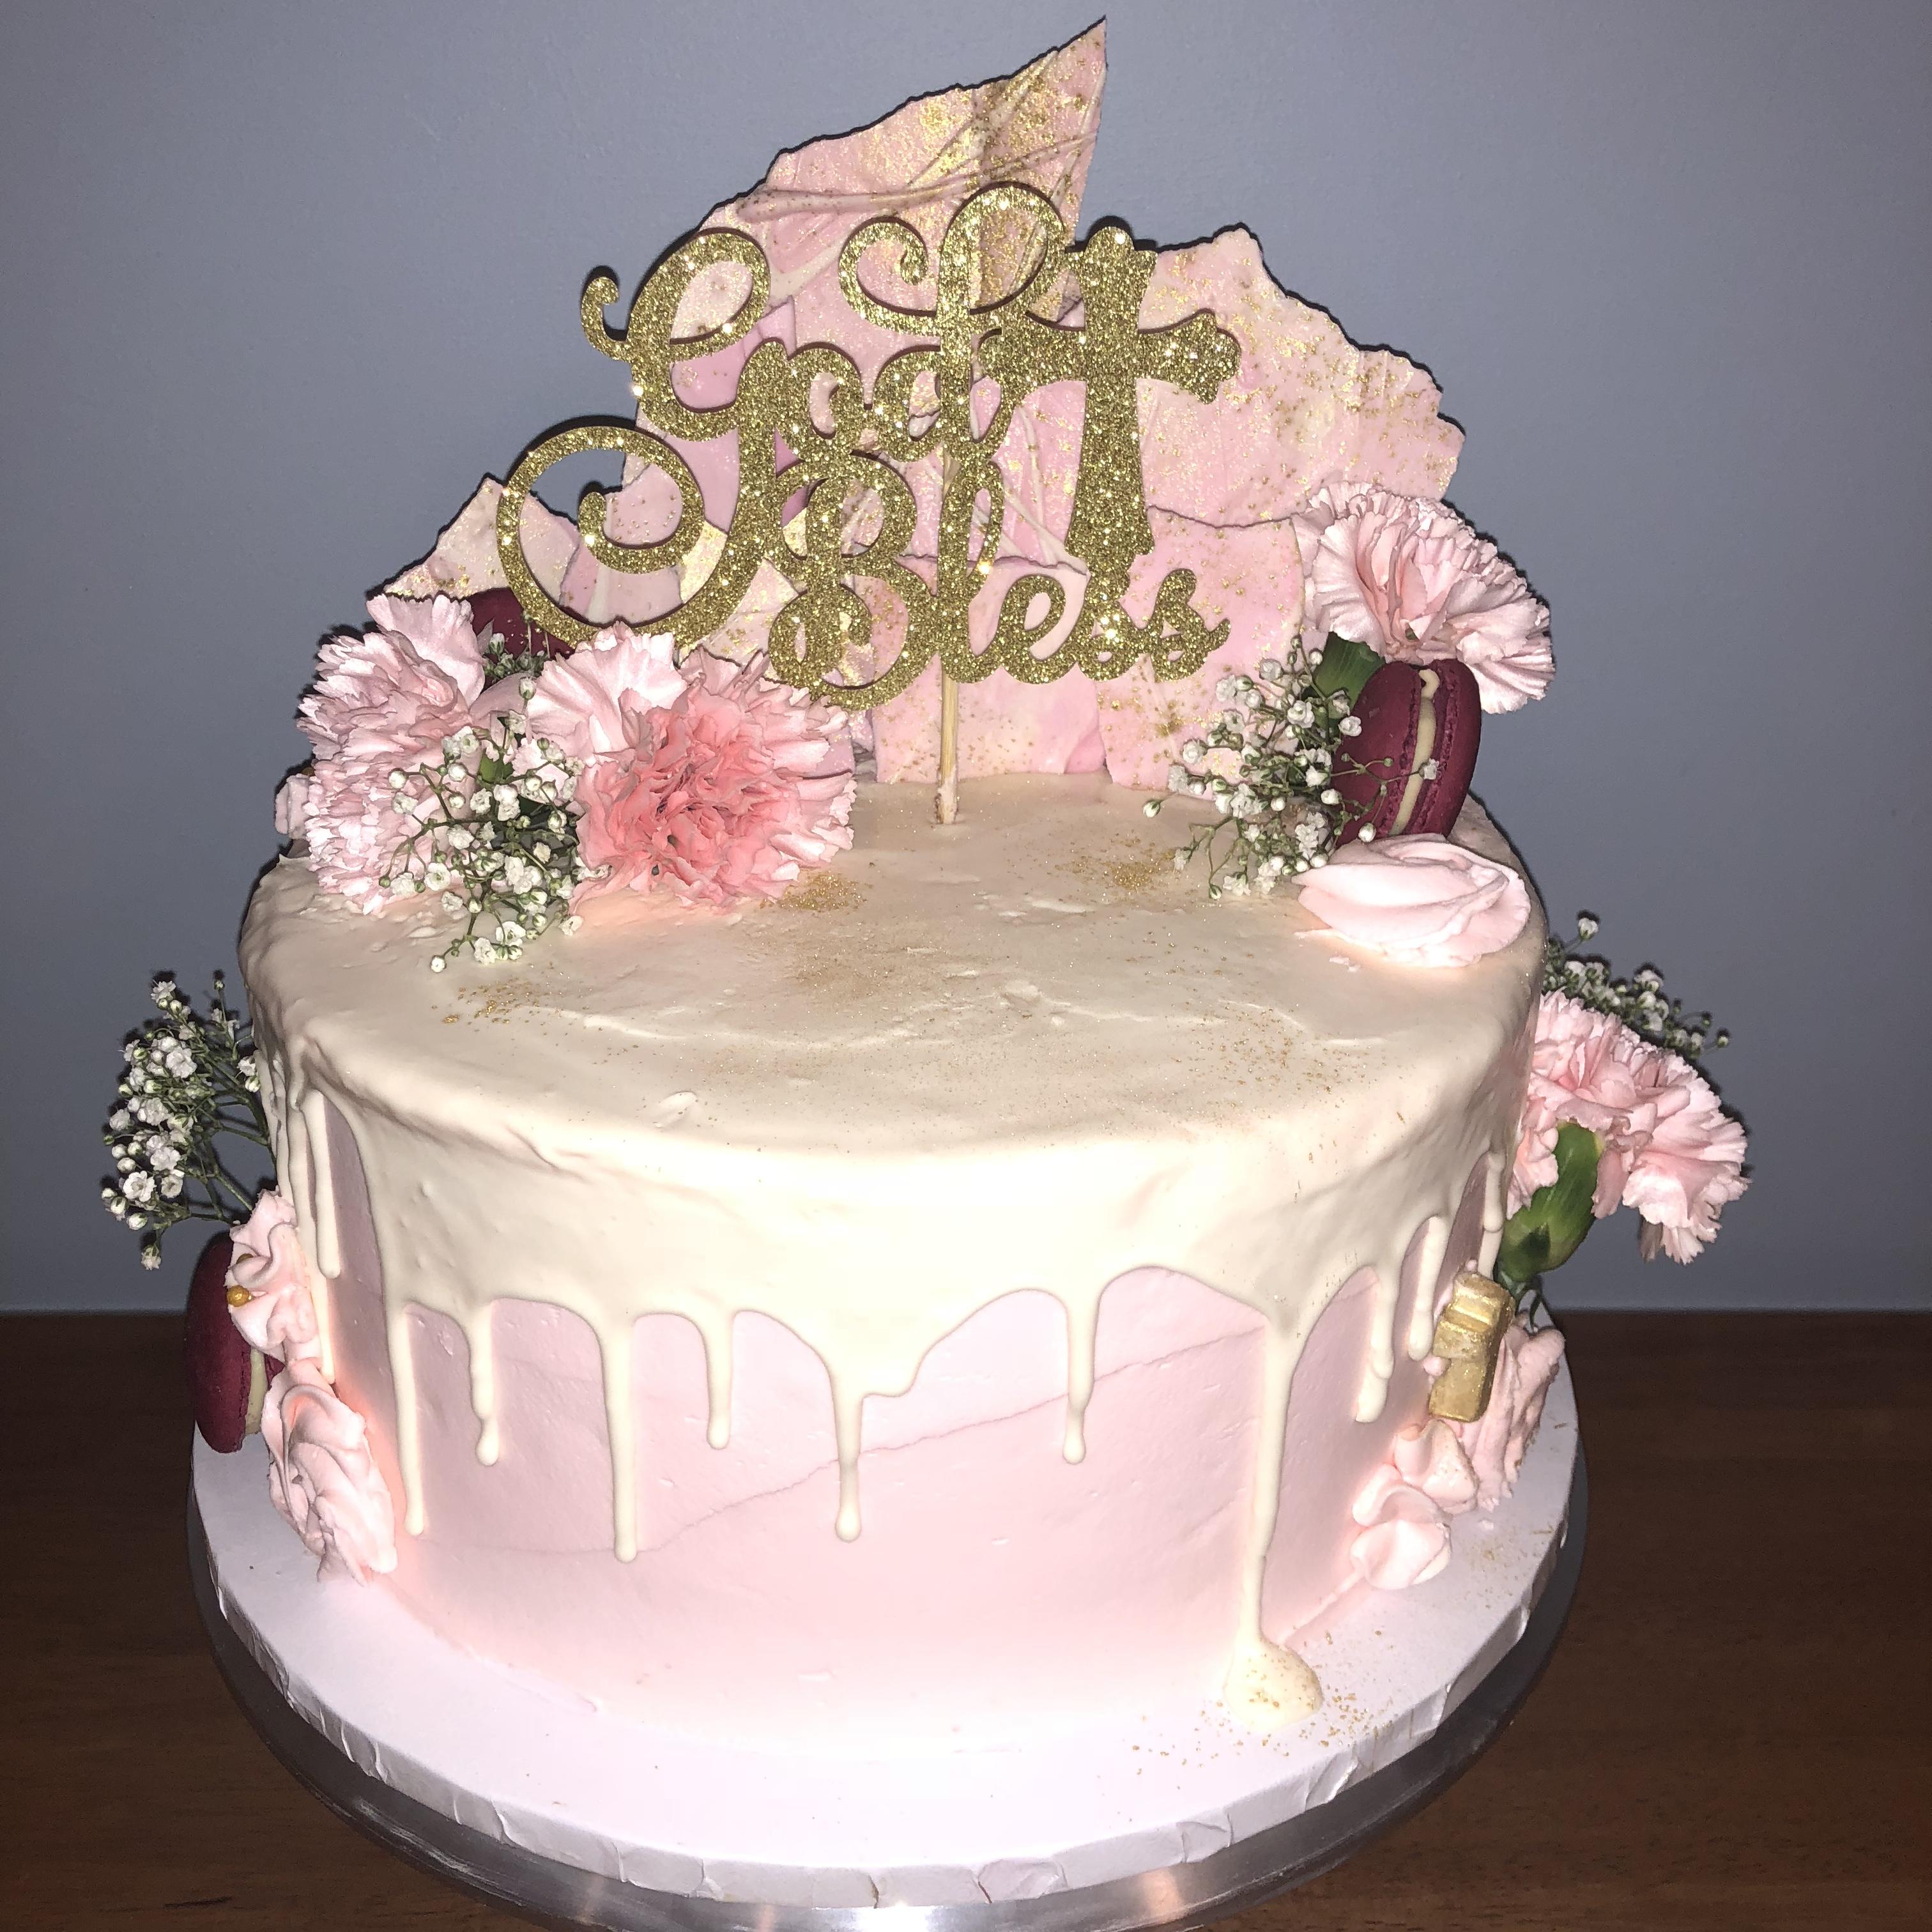 Christening CakeDrip